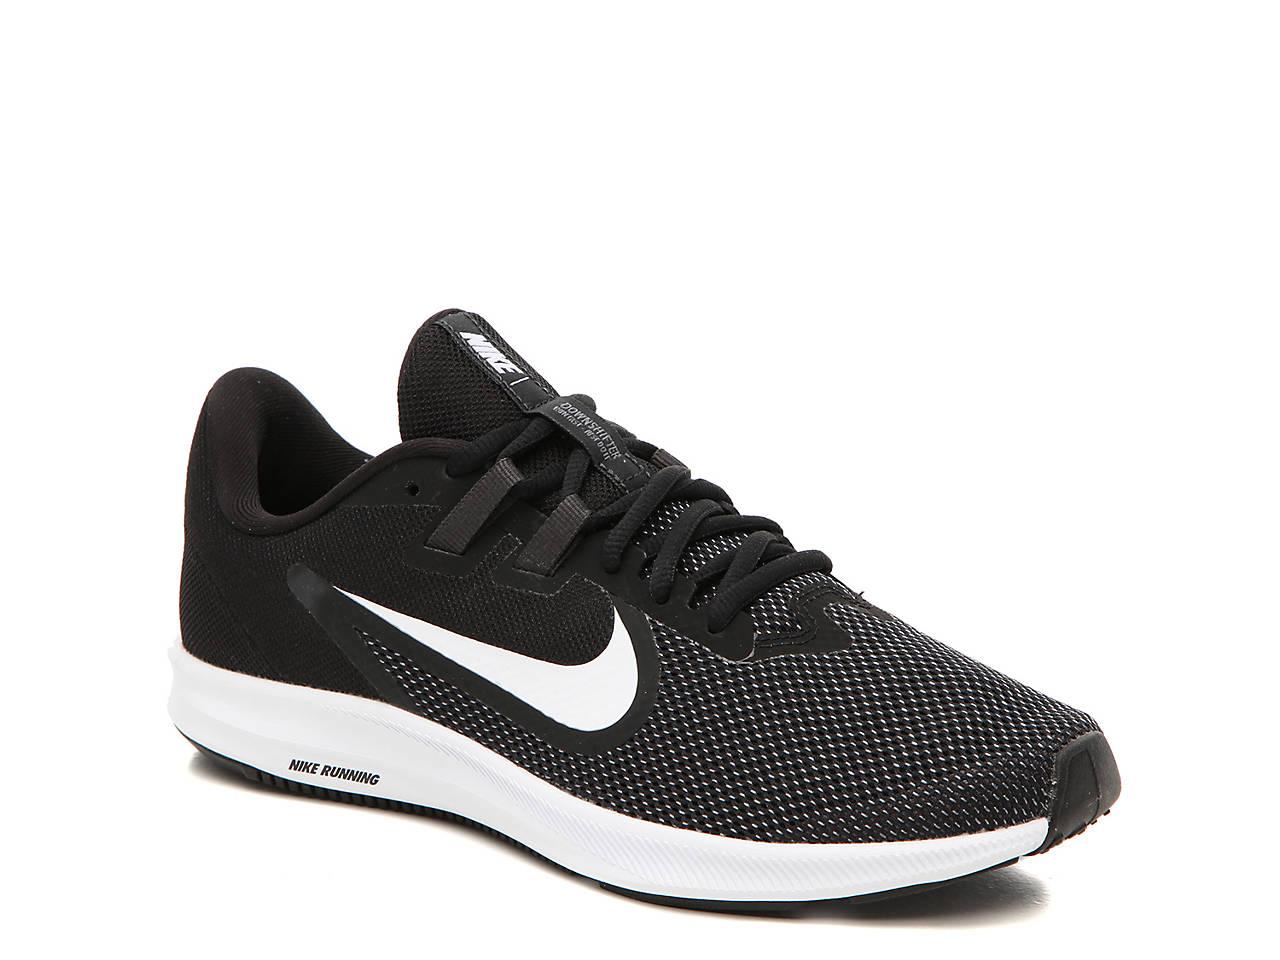 Downshifter 9 Lightweight Running Shoe   Women's by Nike